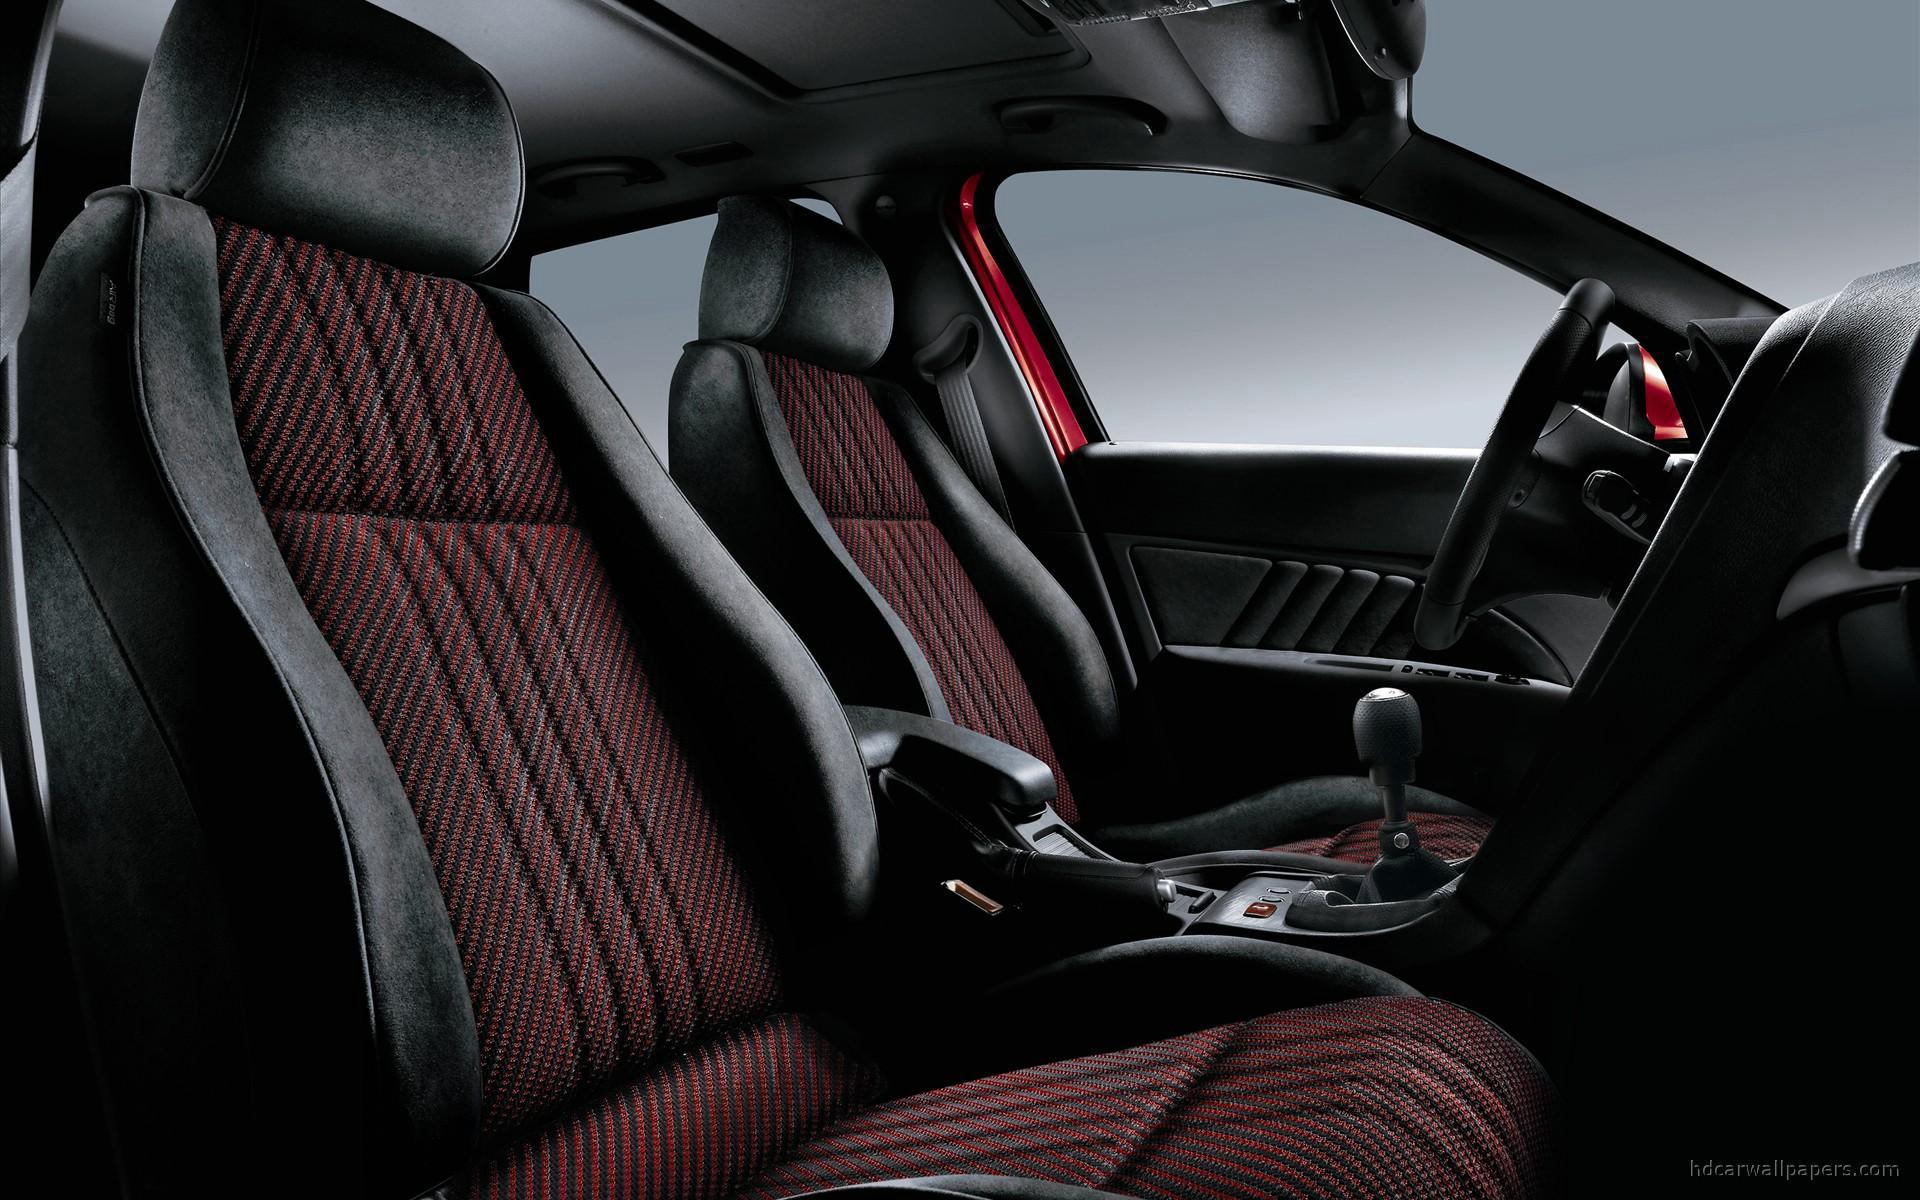 2009 Alfa Romeo 159 Interior Wallpaper Hd Car Wallpapers Id 17 Tags